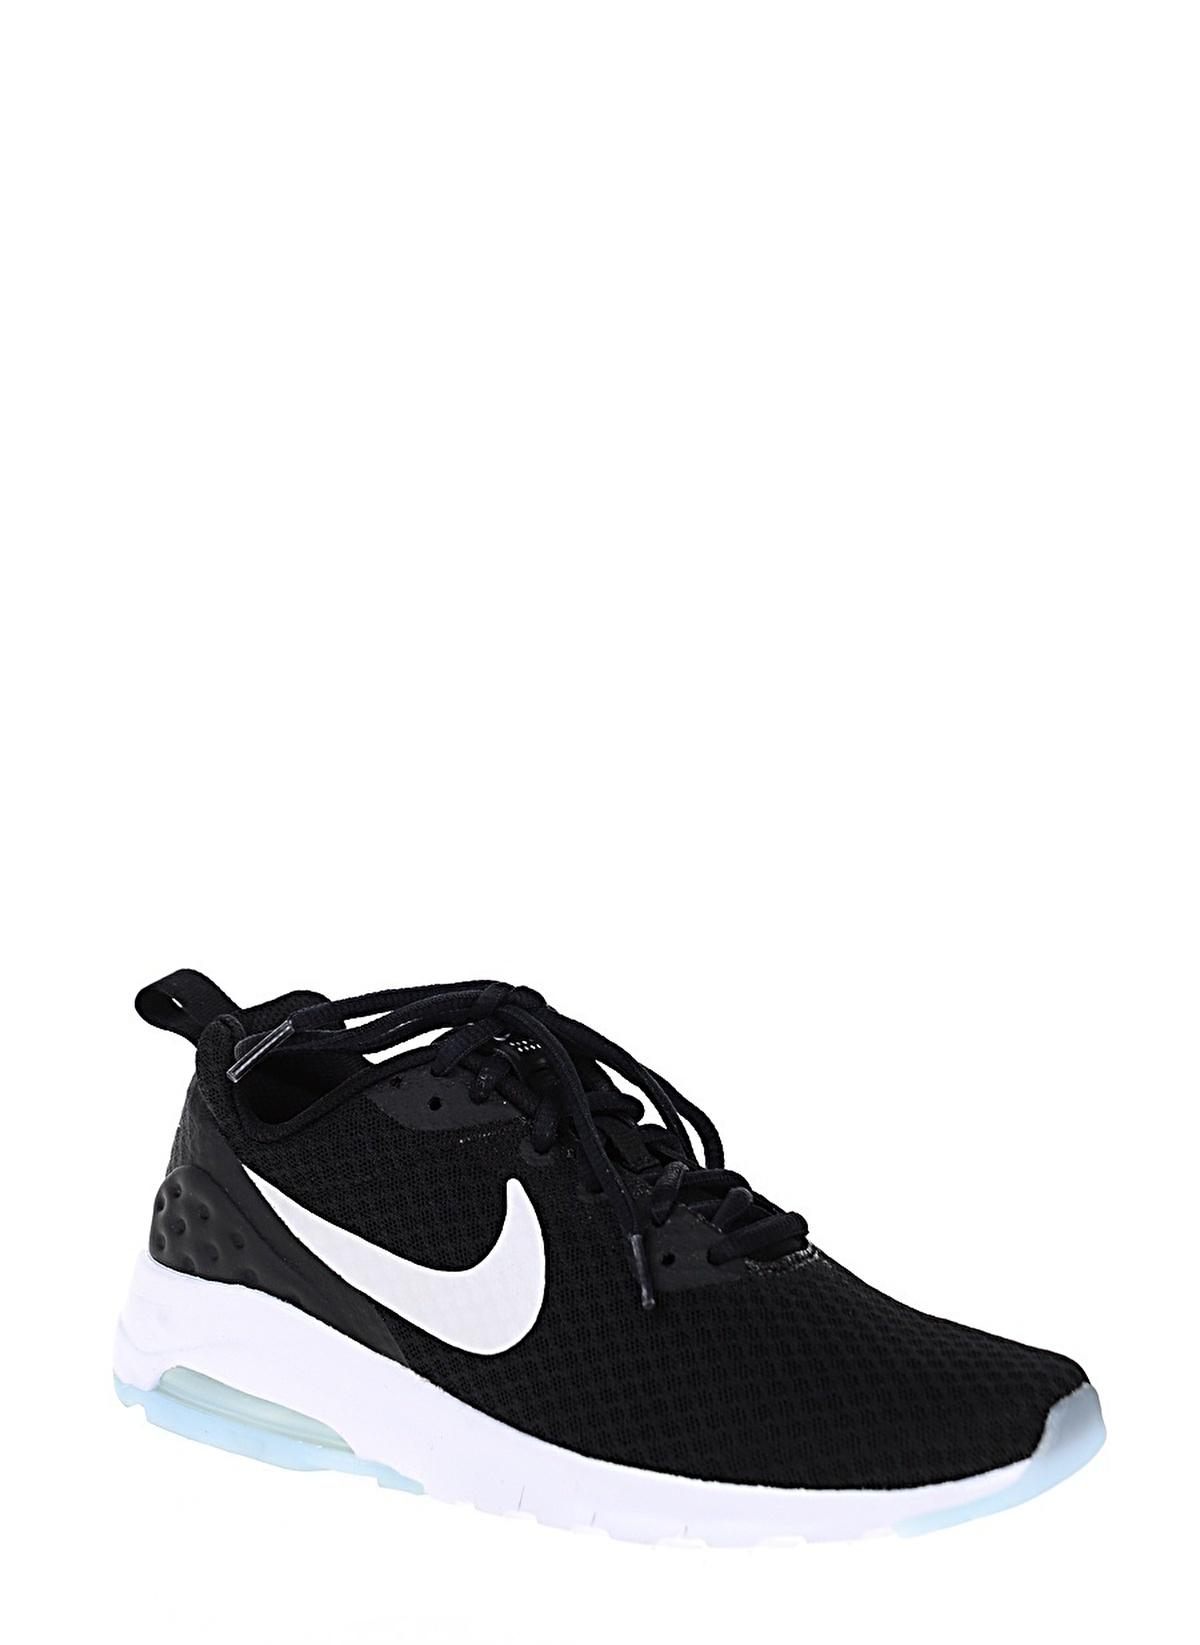 new styles e2e13 a4980 Nike Air Max Motion Lw Siyah ...